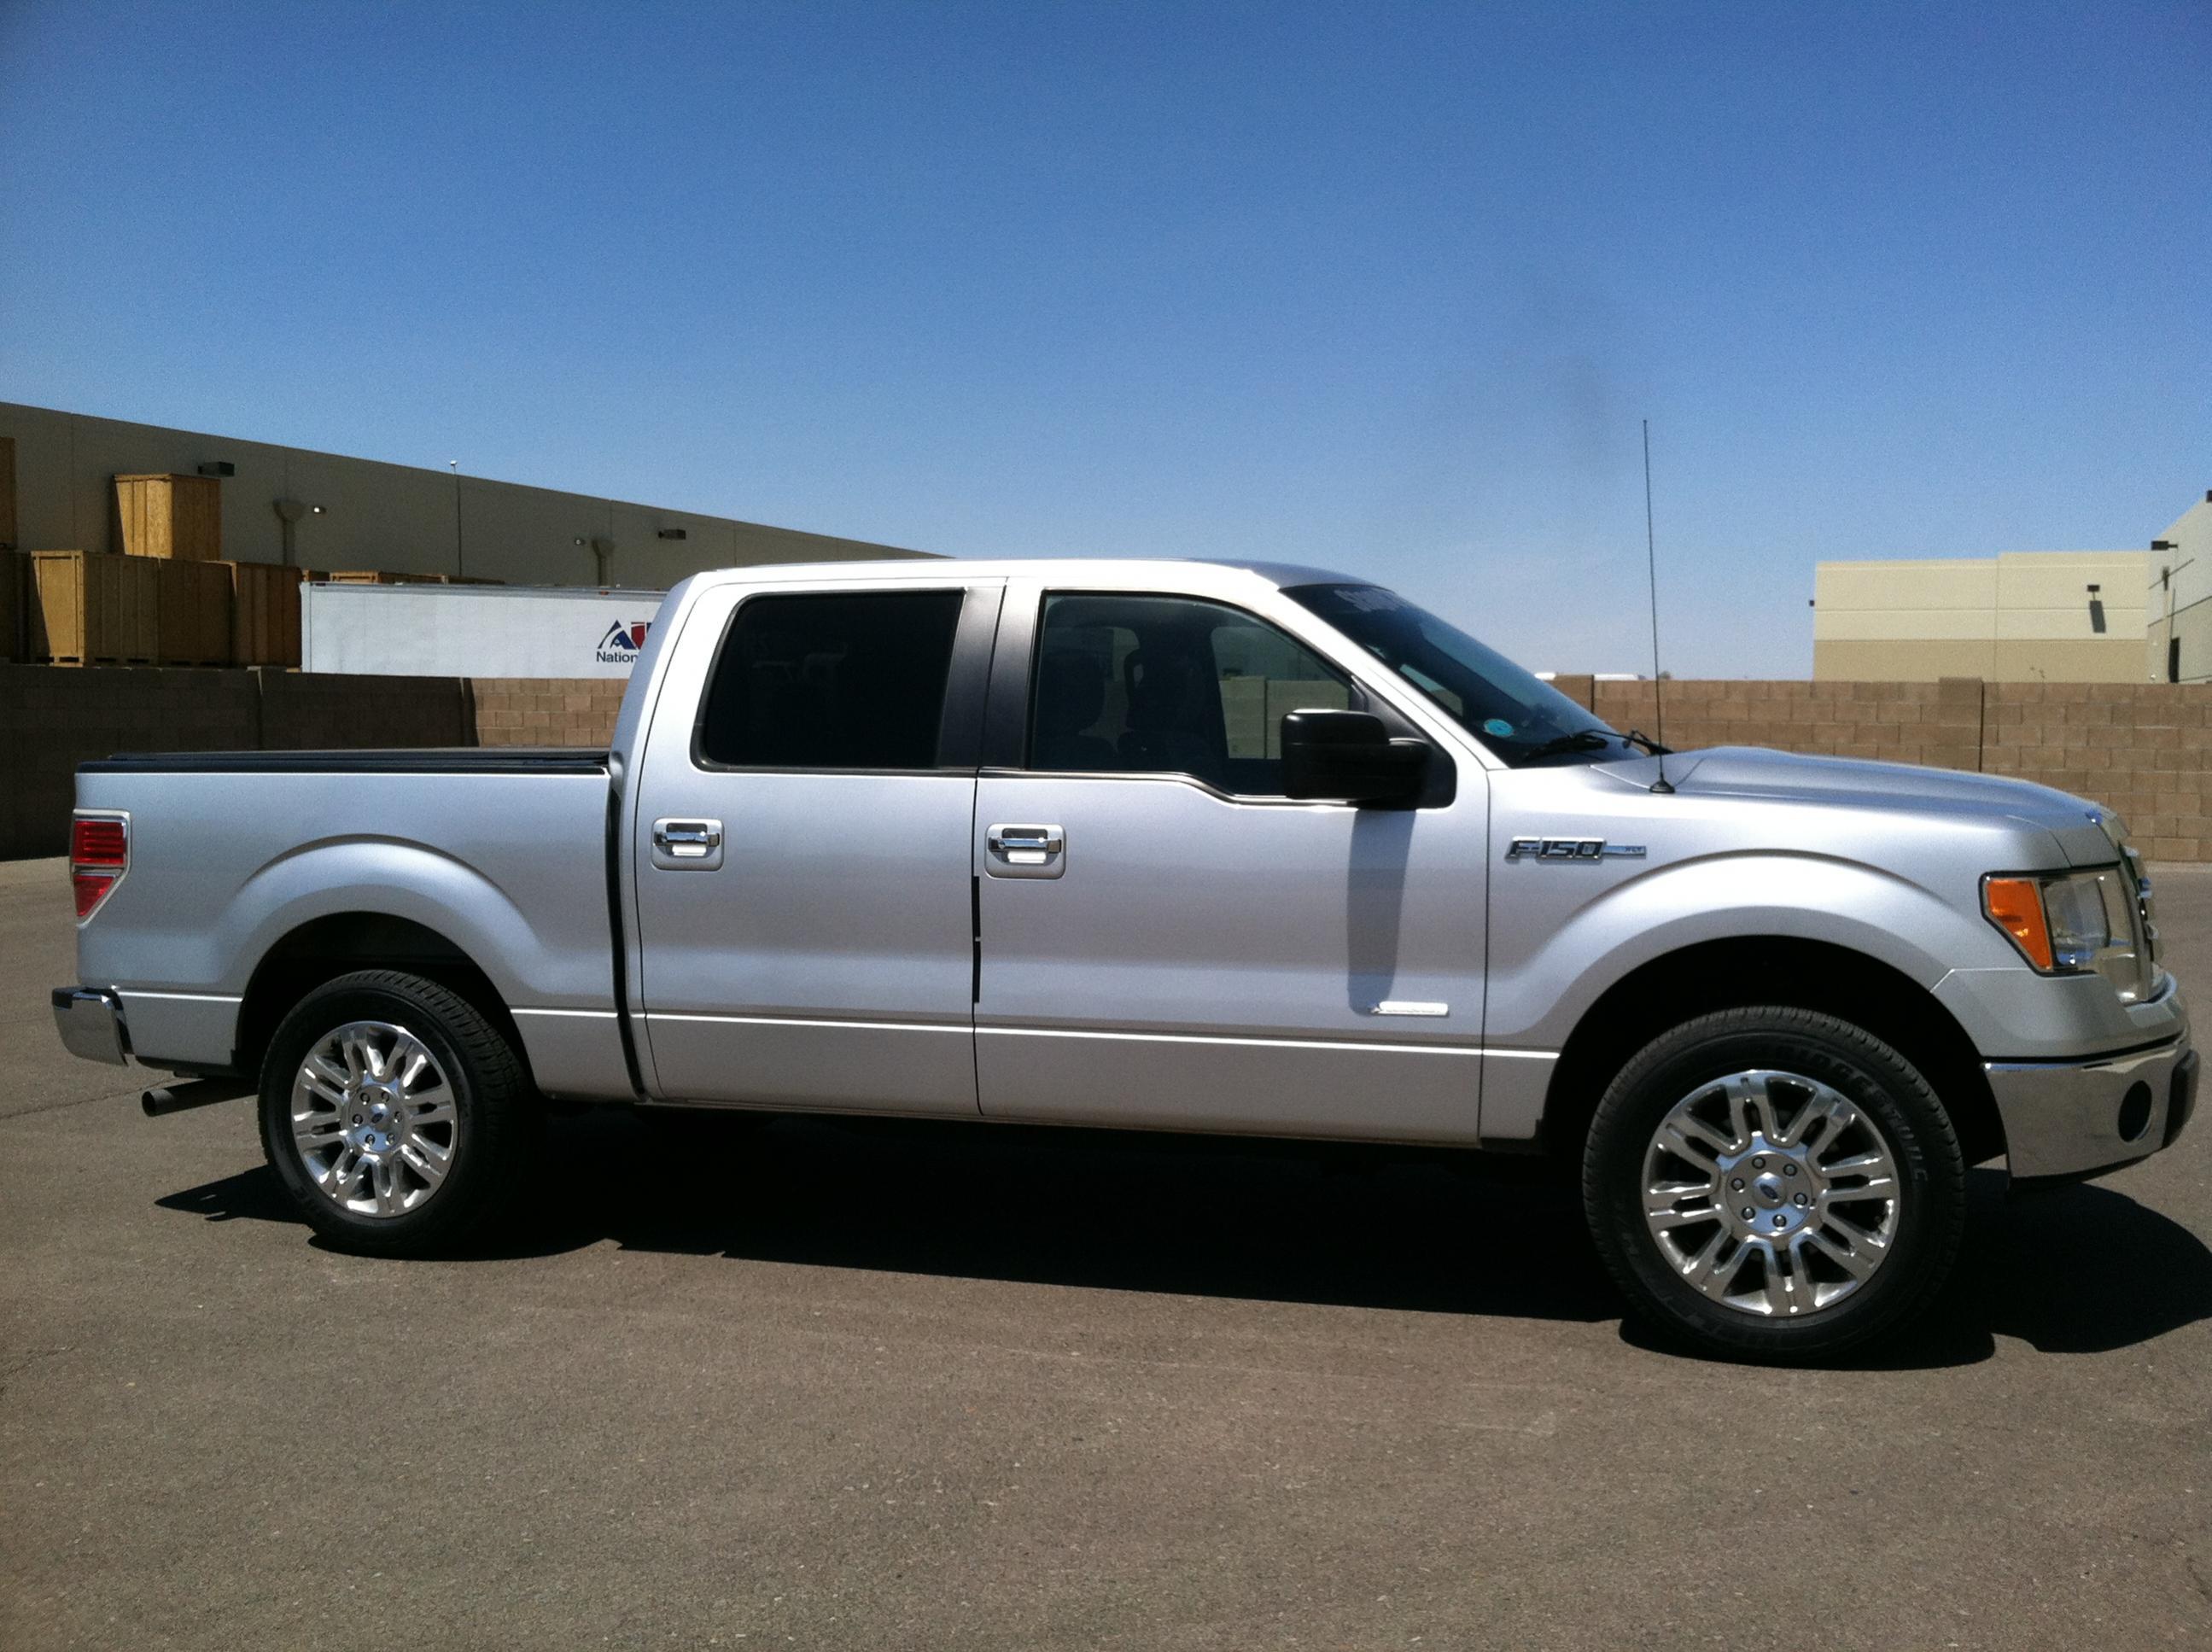 Name f150 xlt platinum wheels 20 oem ford jpg views 78849 size